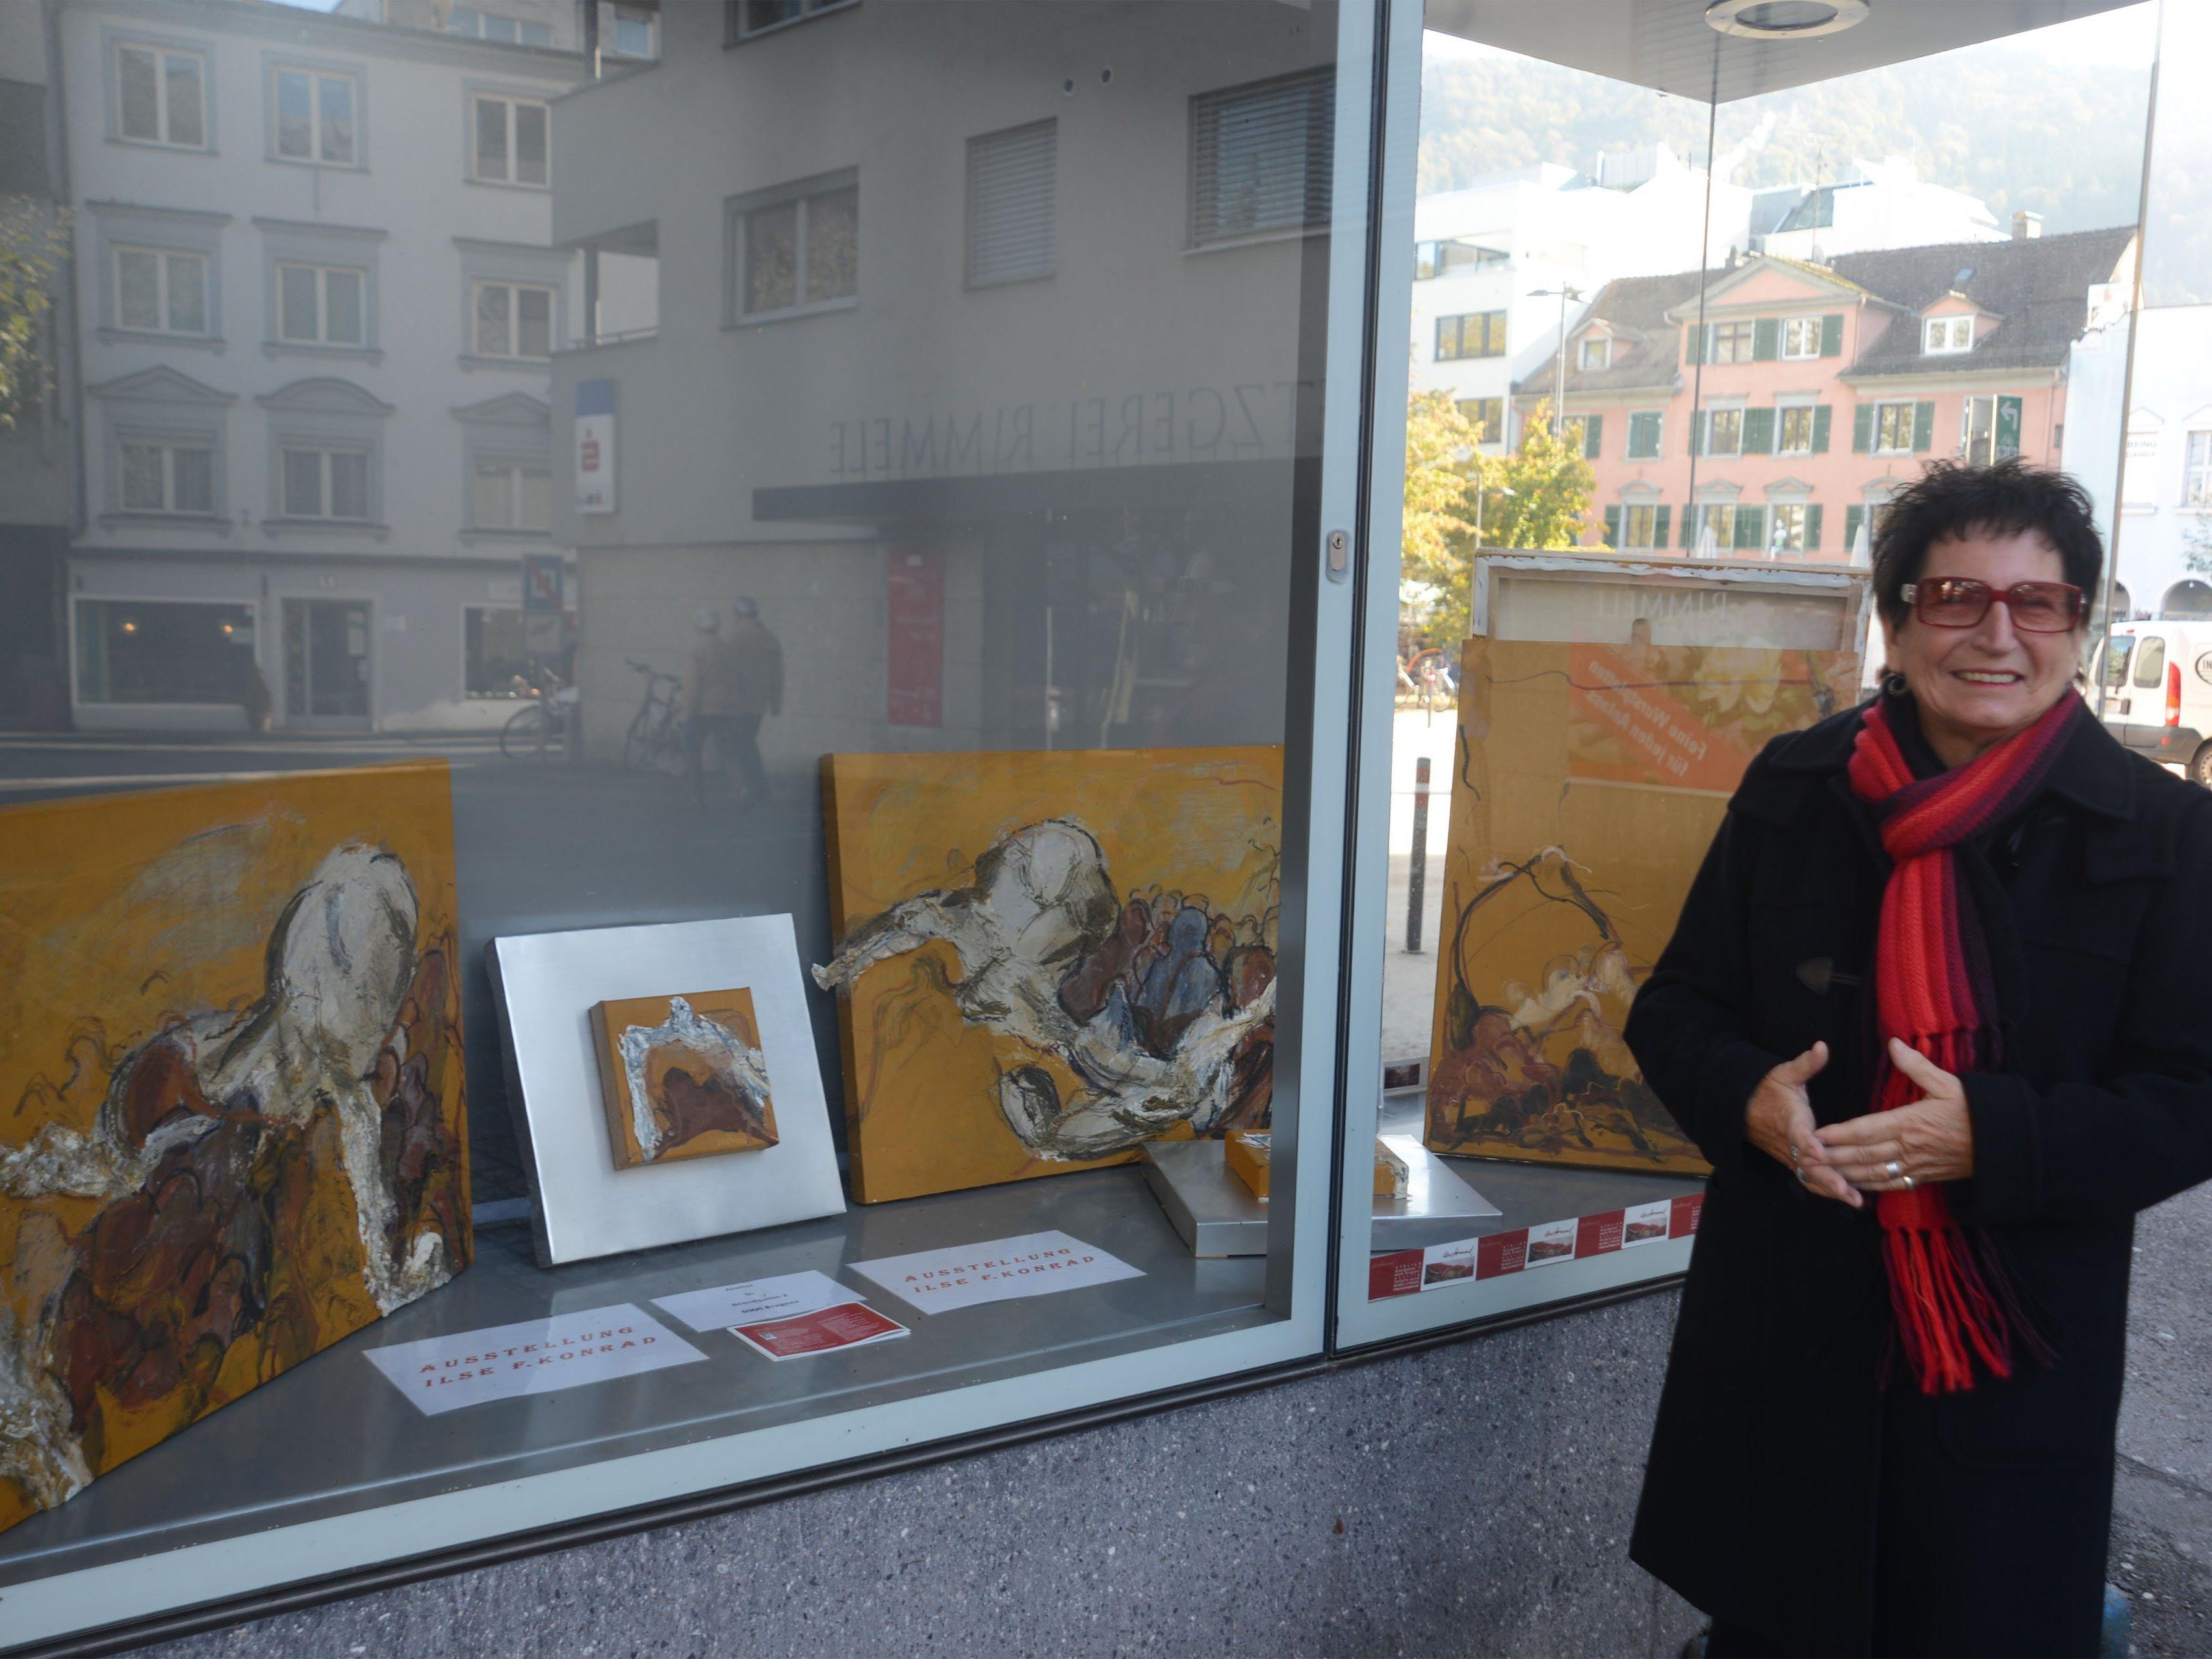 Ilse F. Konrad vor dem Kunstterminal am Sparkassenplatz.